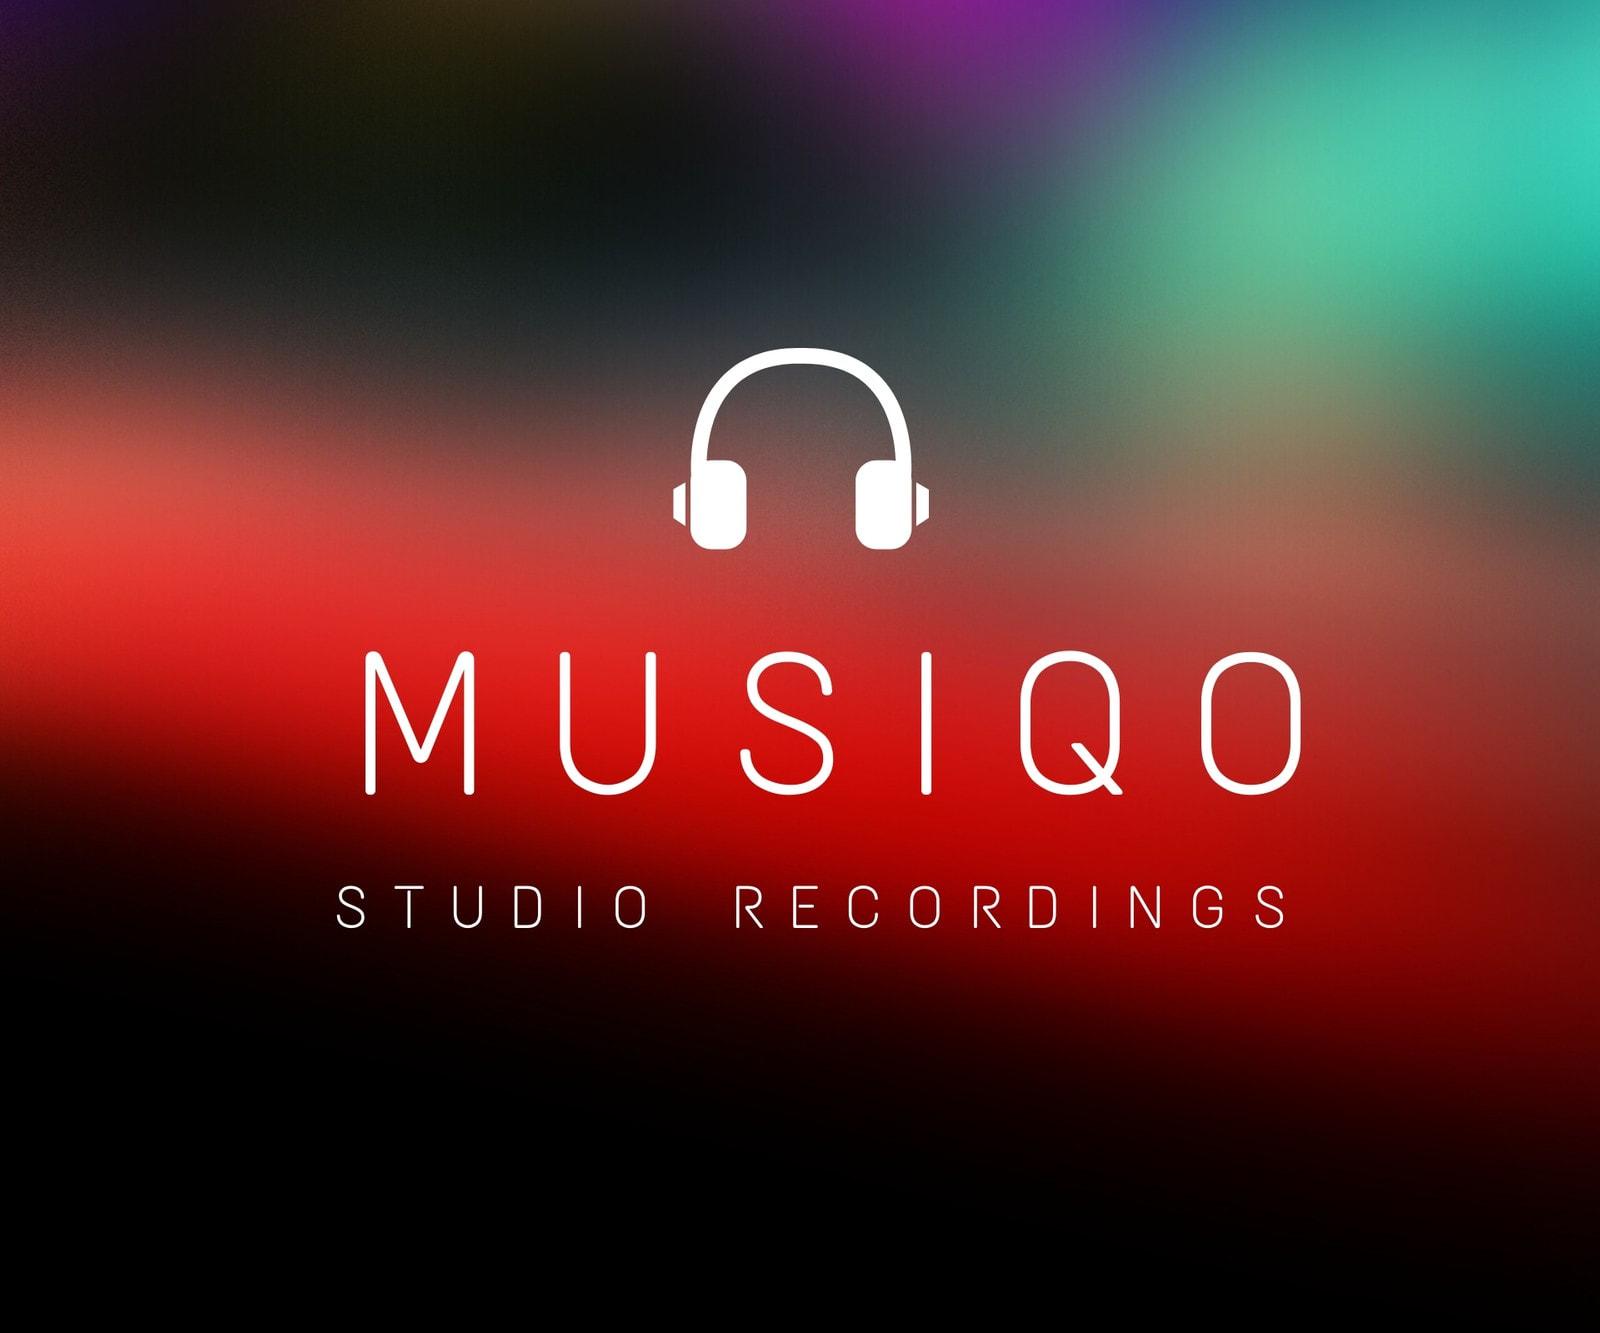 Blurred Photo Studio Recording Medium Rectangle Banner